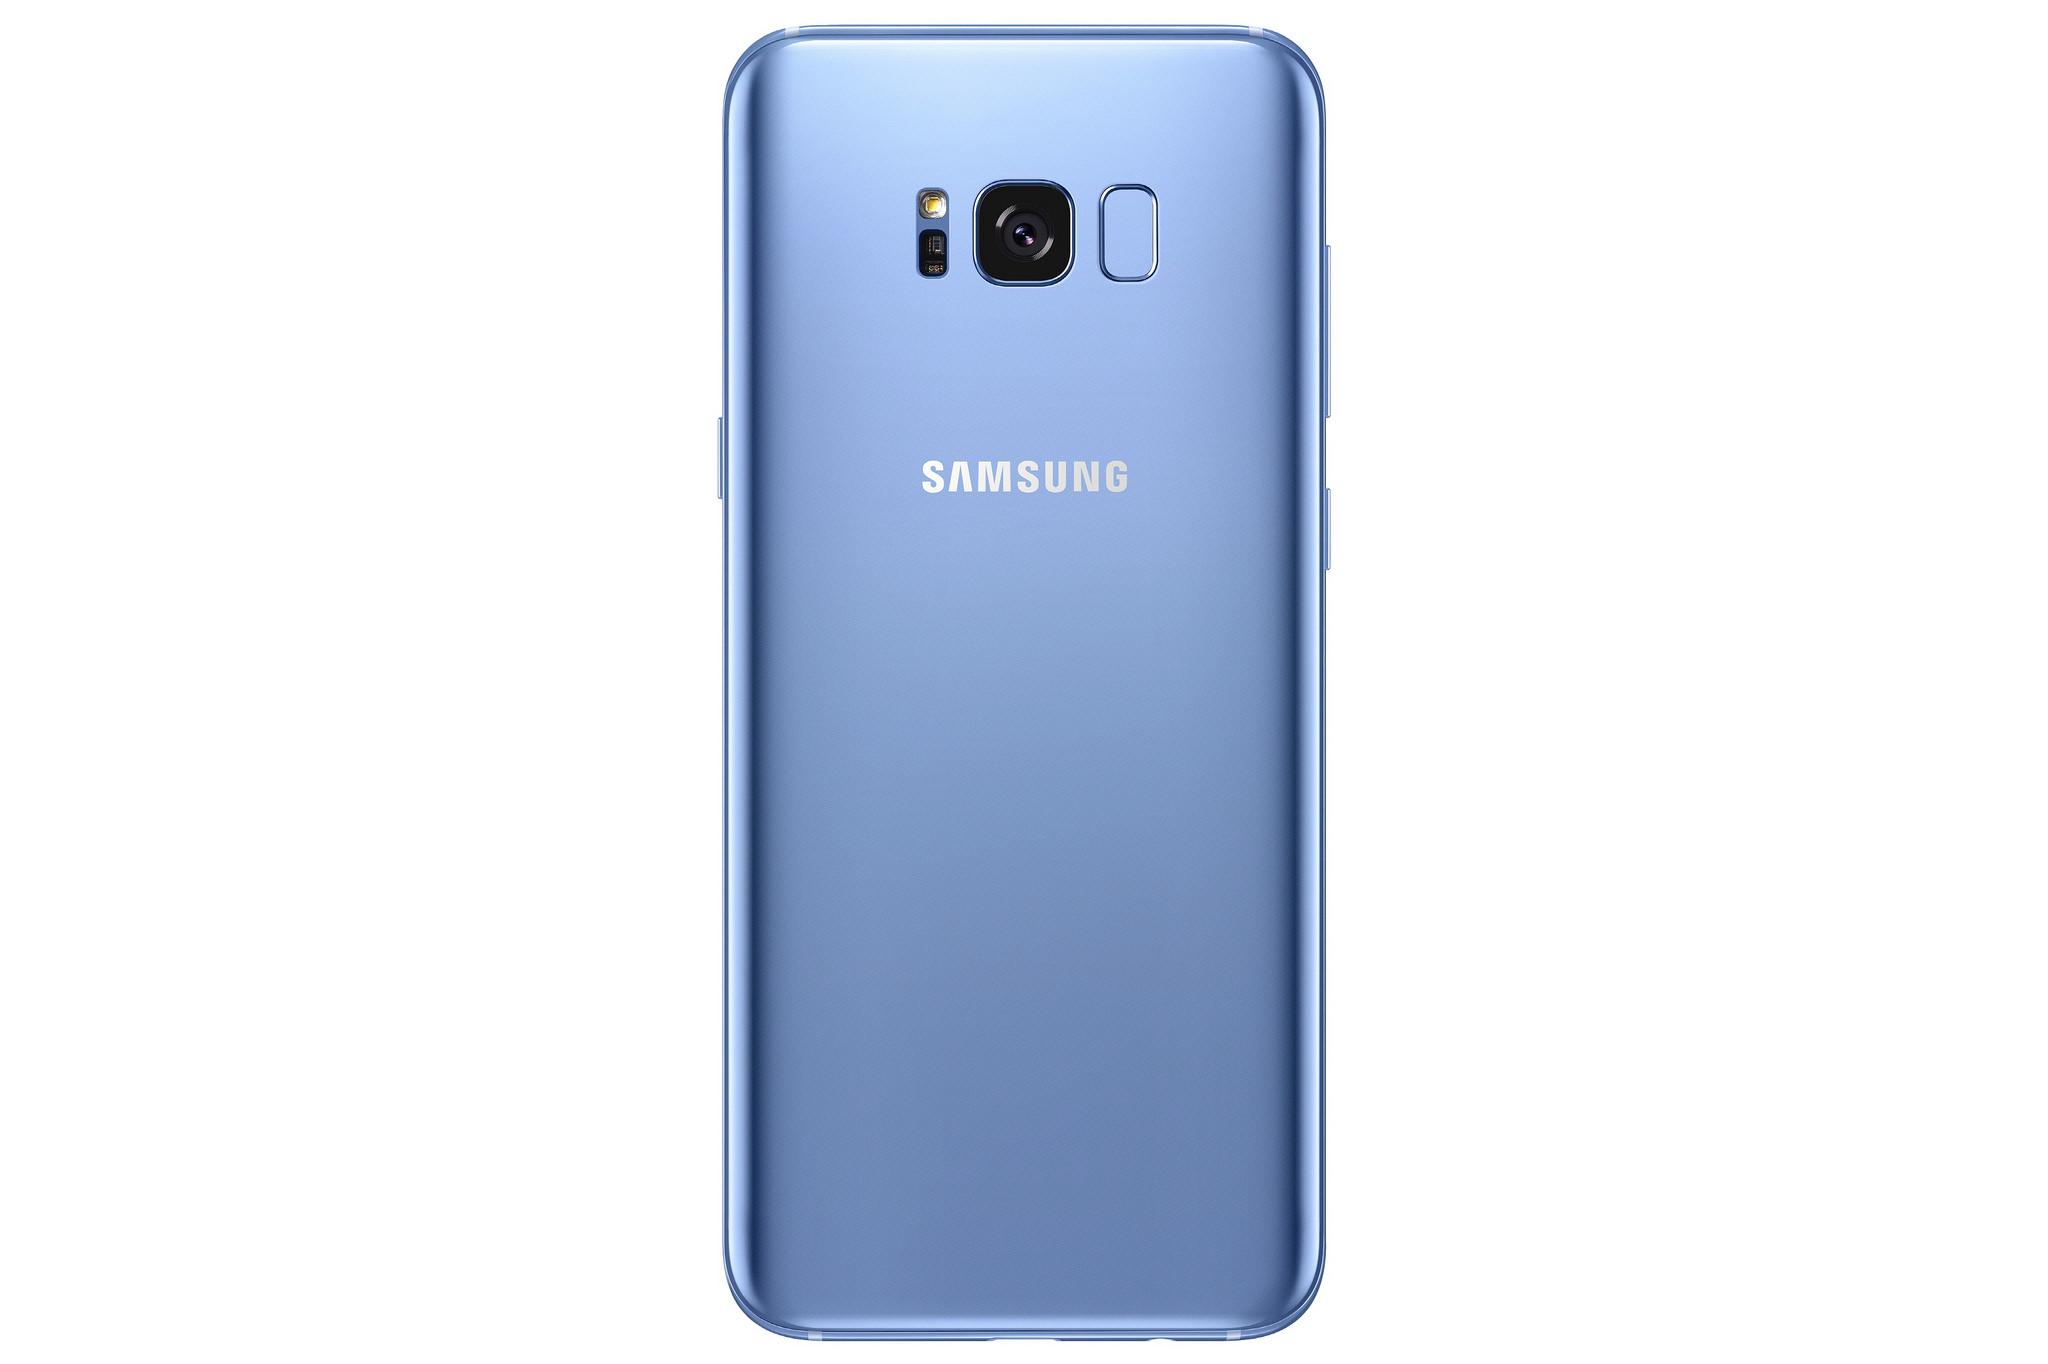 Samsung Galaxy S8 rear